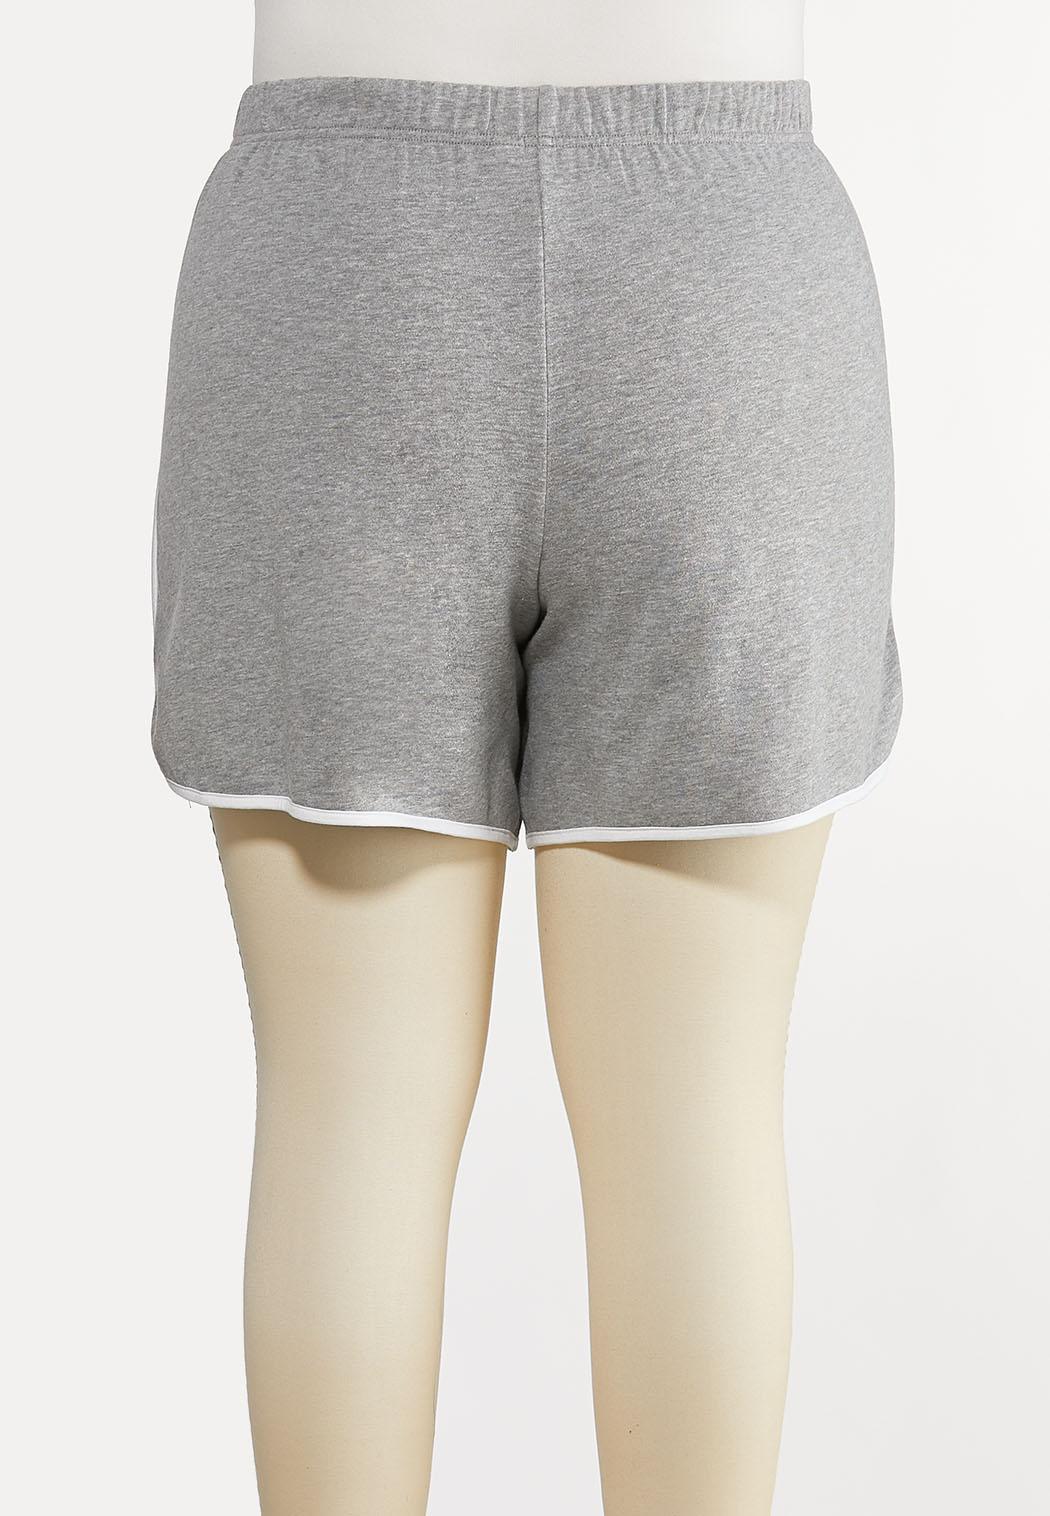 Plus Size Gray Athleisure Shorts (Item #44213822)